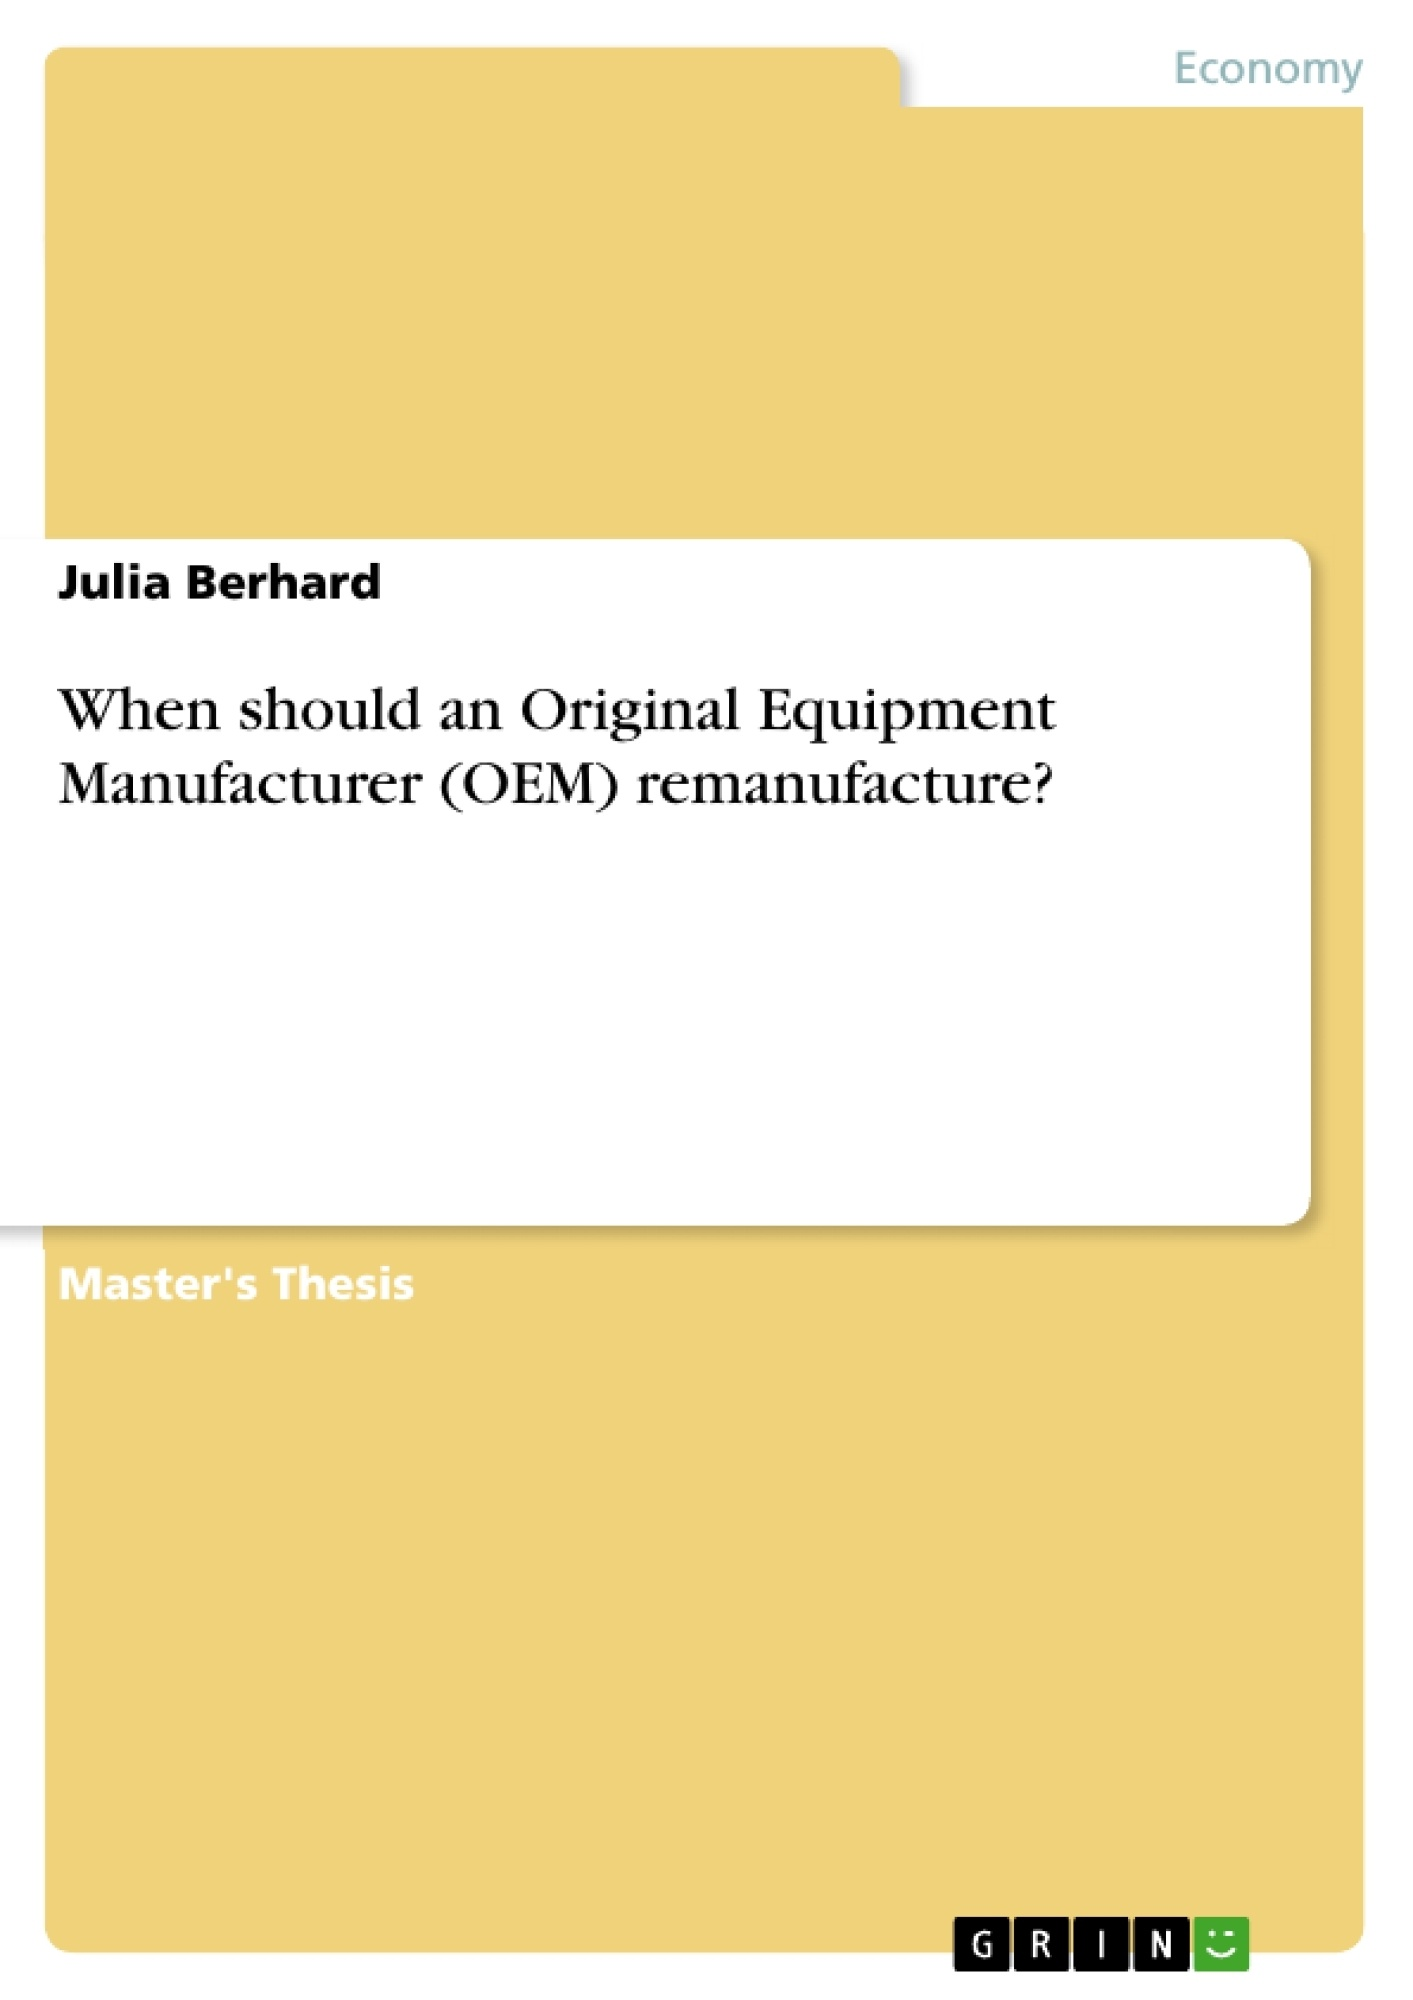 Title: When should an Original Equipment Manufacturer (OEM) remanufacture?